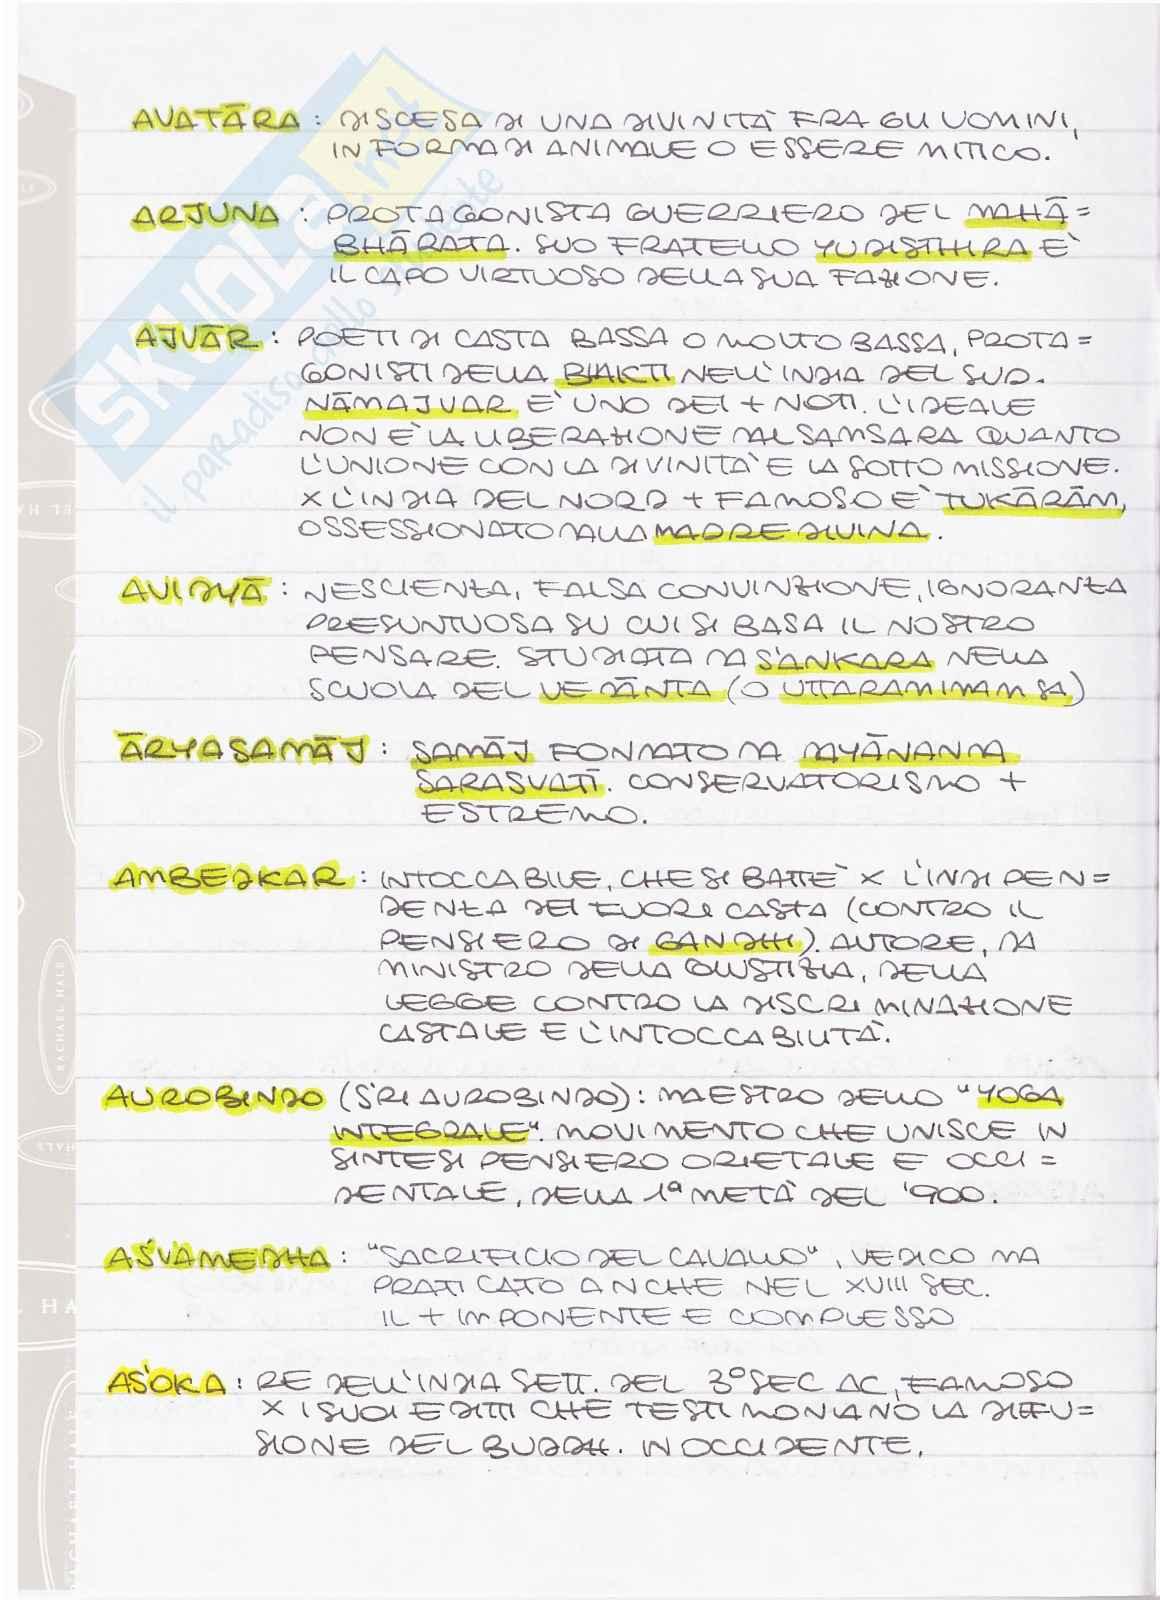 Filosofia indiana - Terminologia specifica Pag. 2